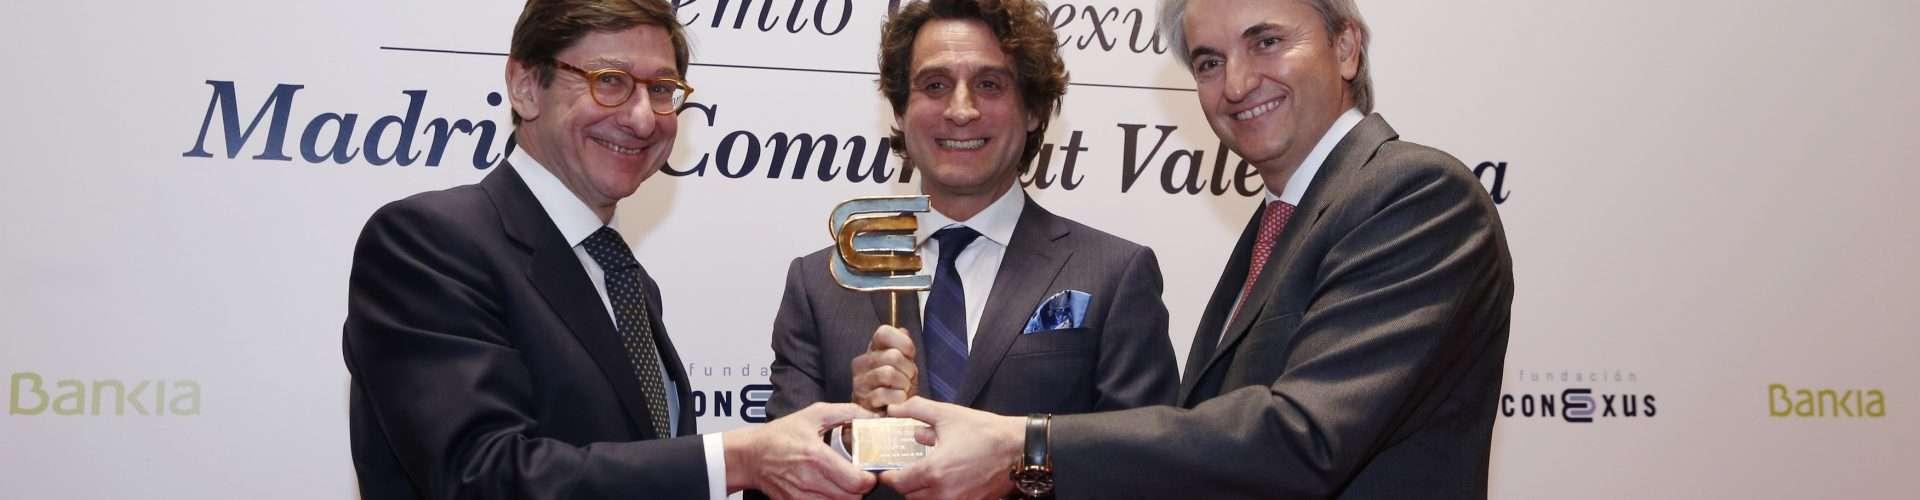 Premio Conexus